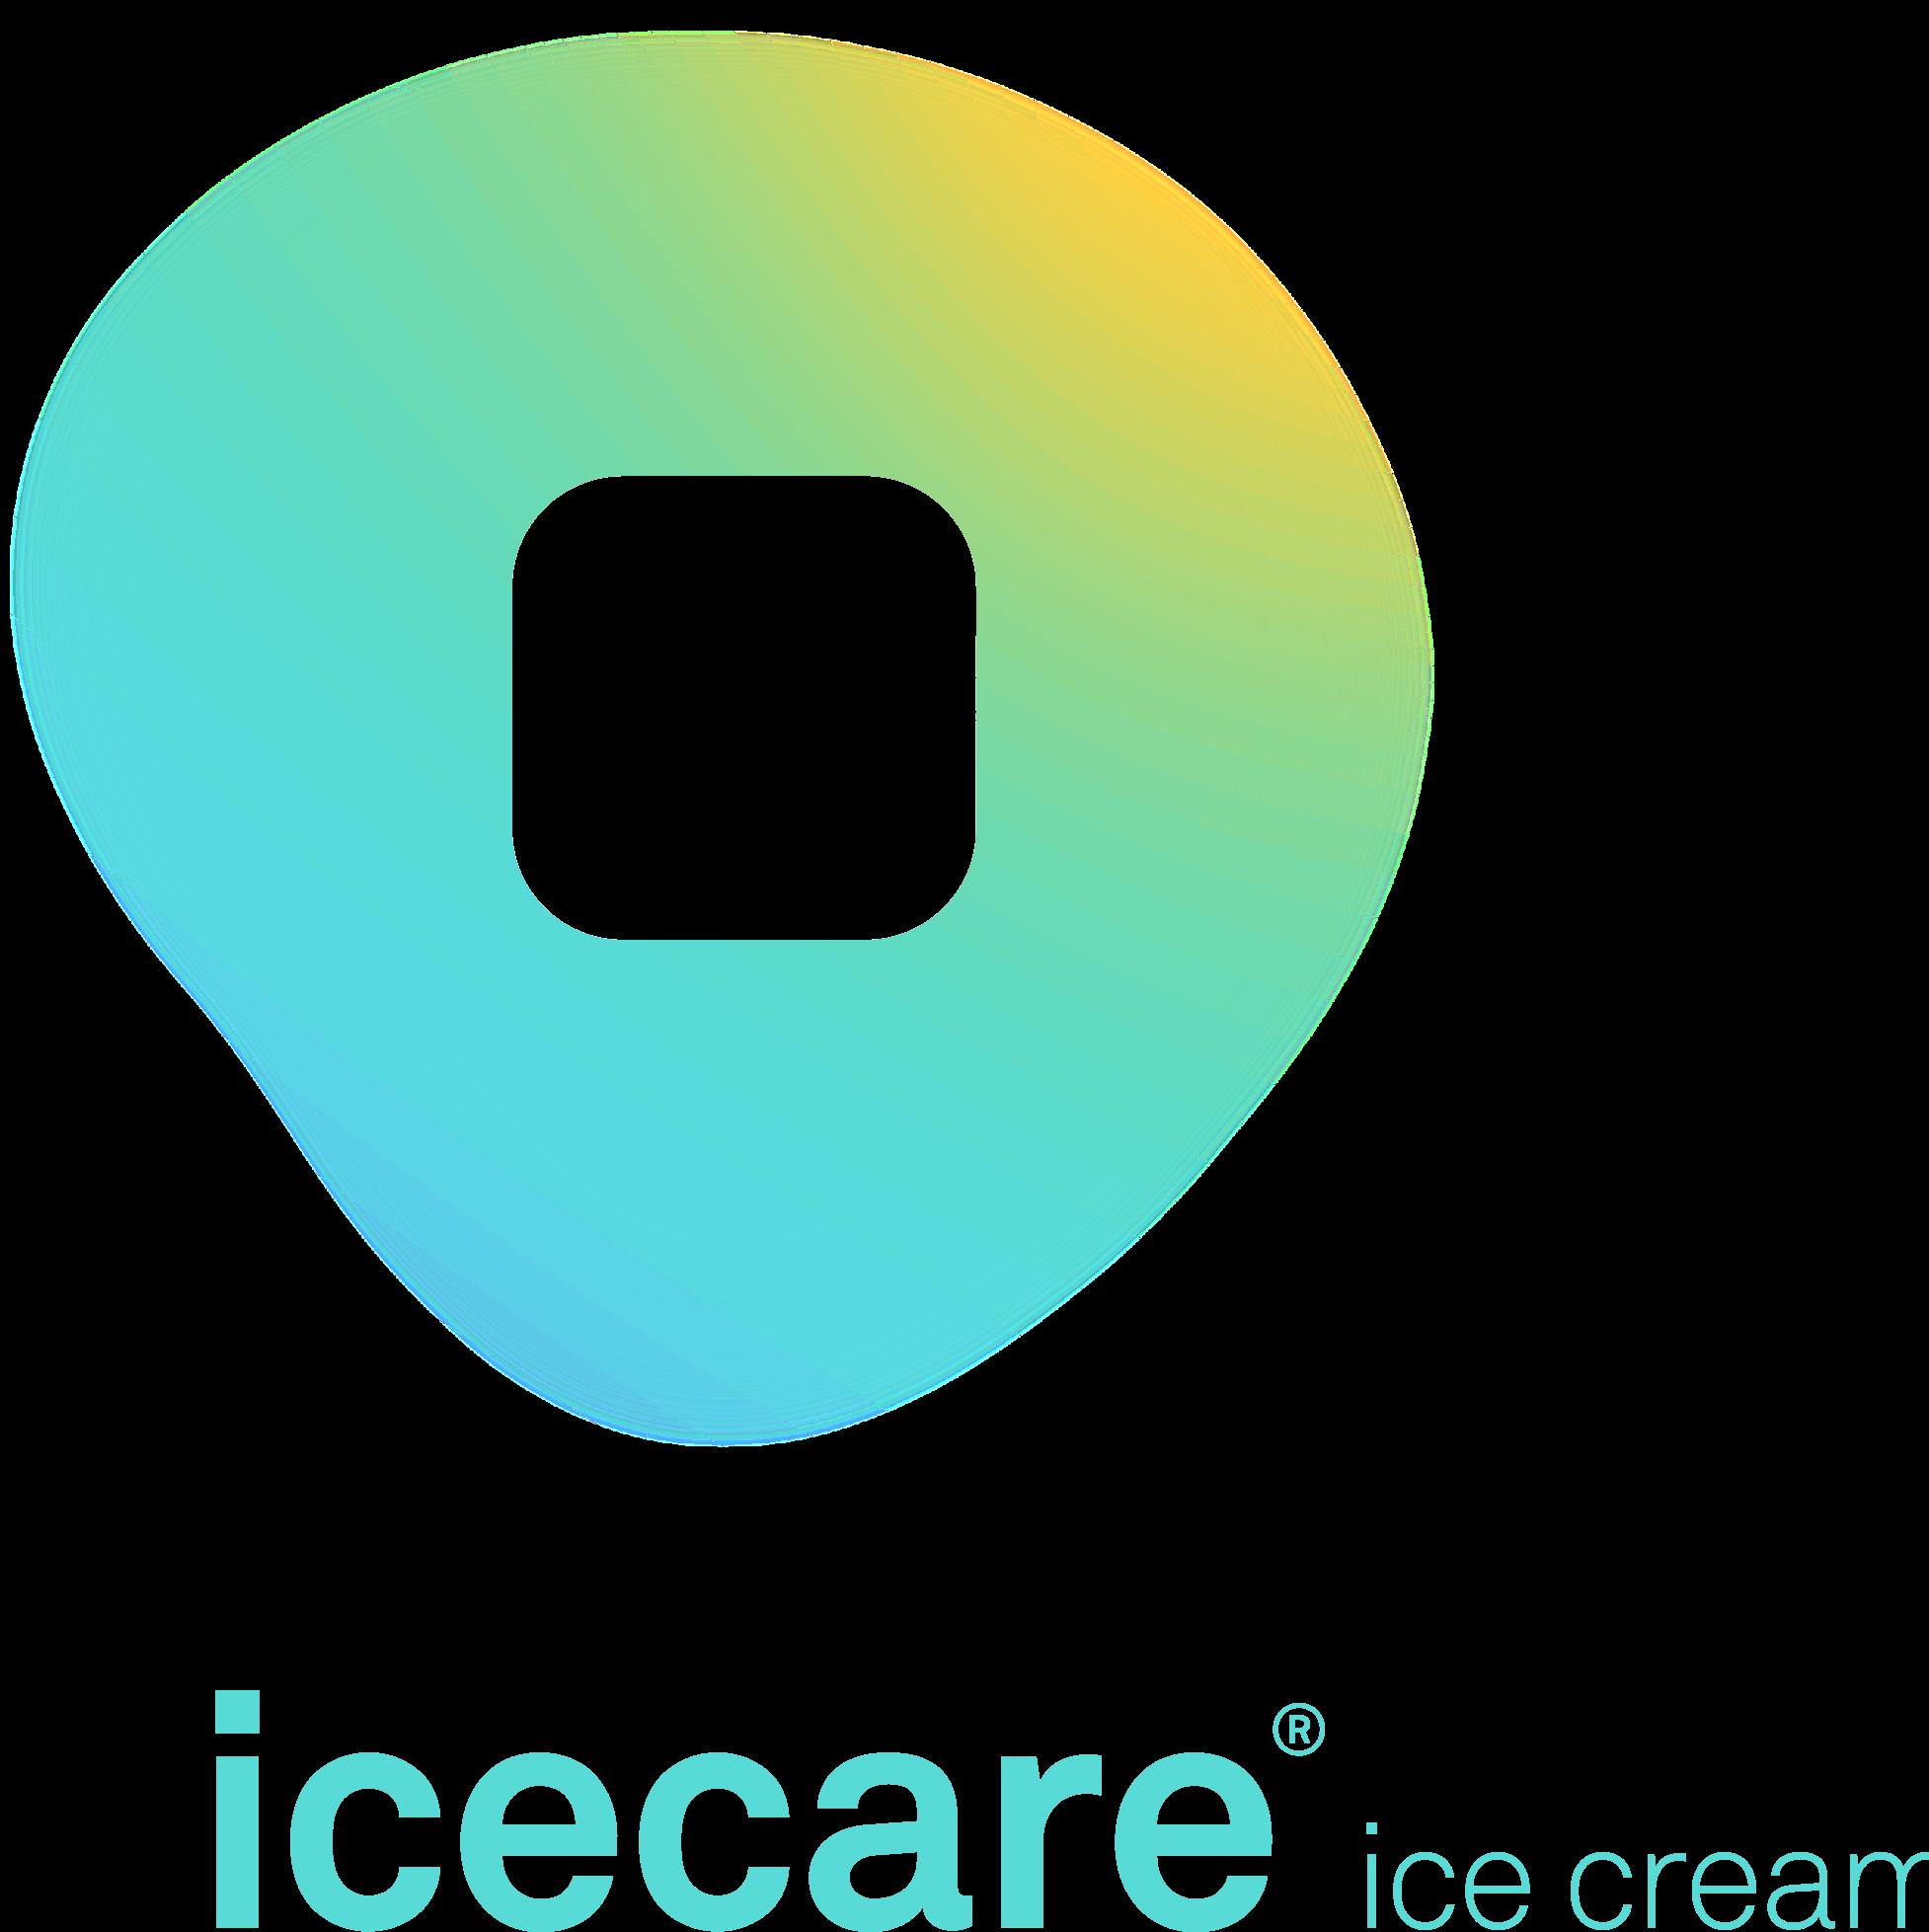 icecare